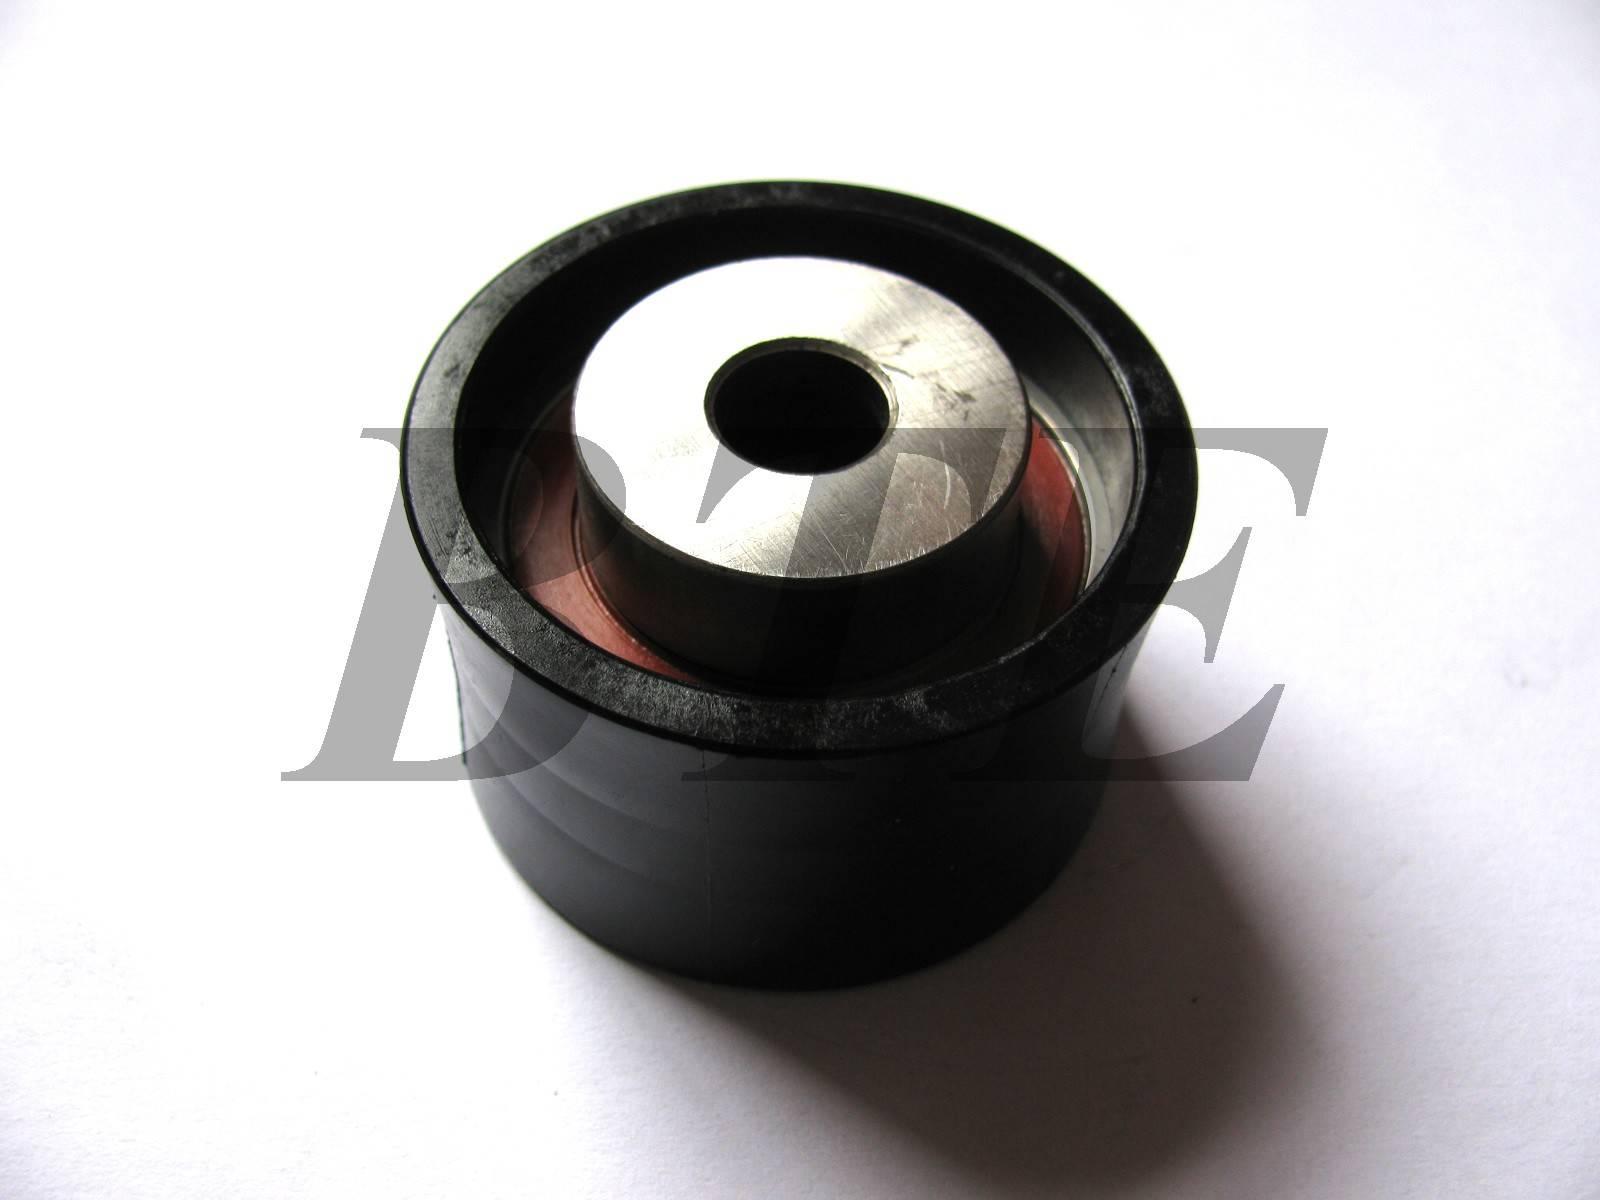 belt tensioner idler pulley for FORD 928M6M250DC 6744307 VKM24211 55211 532009310 T42033 ATB2289